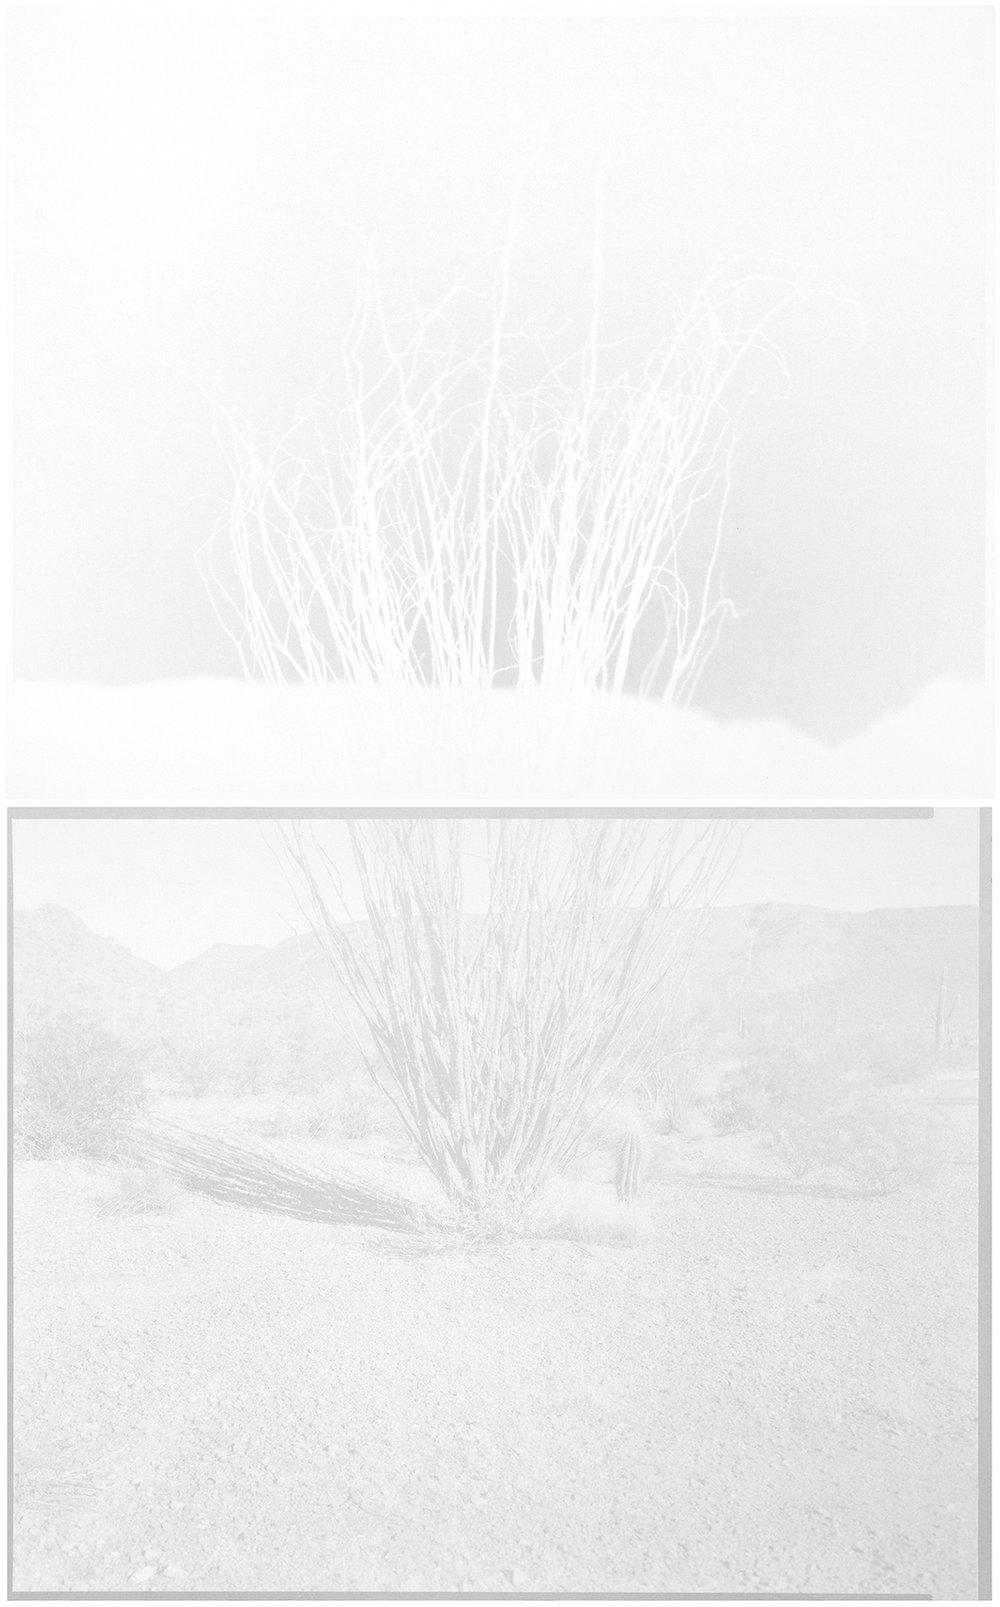 scott b. davis   ocotillo (arizona upland),  2013   unique paper negative palladium/platinum prints, diptych   32 x 20 inches (each 16 x 20 inches)